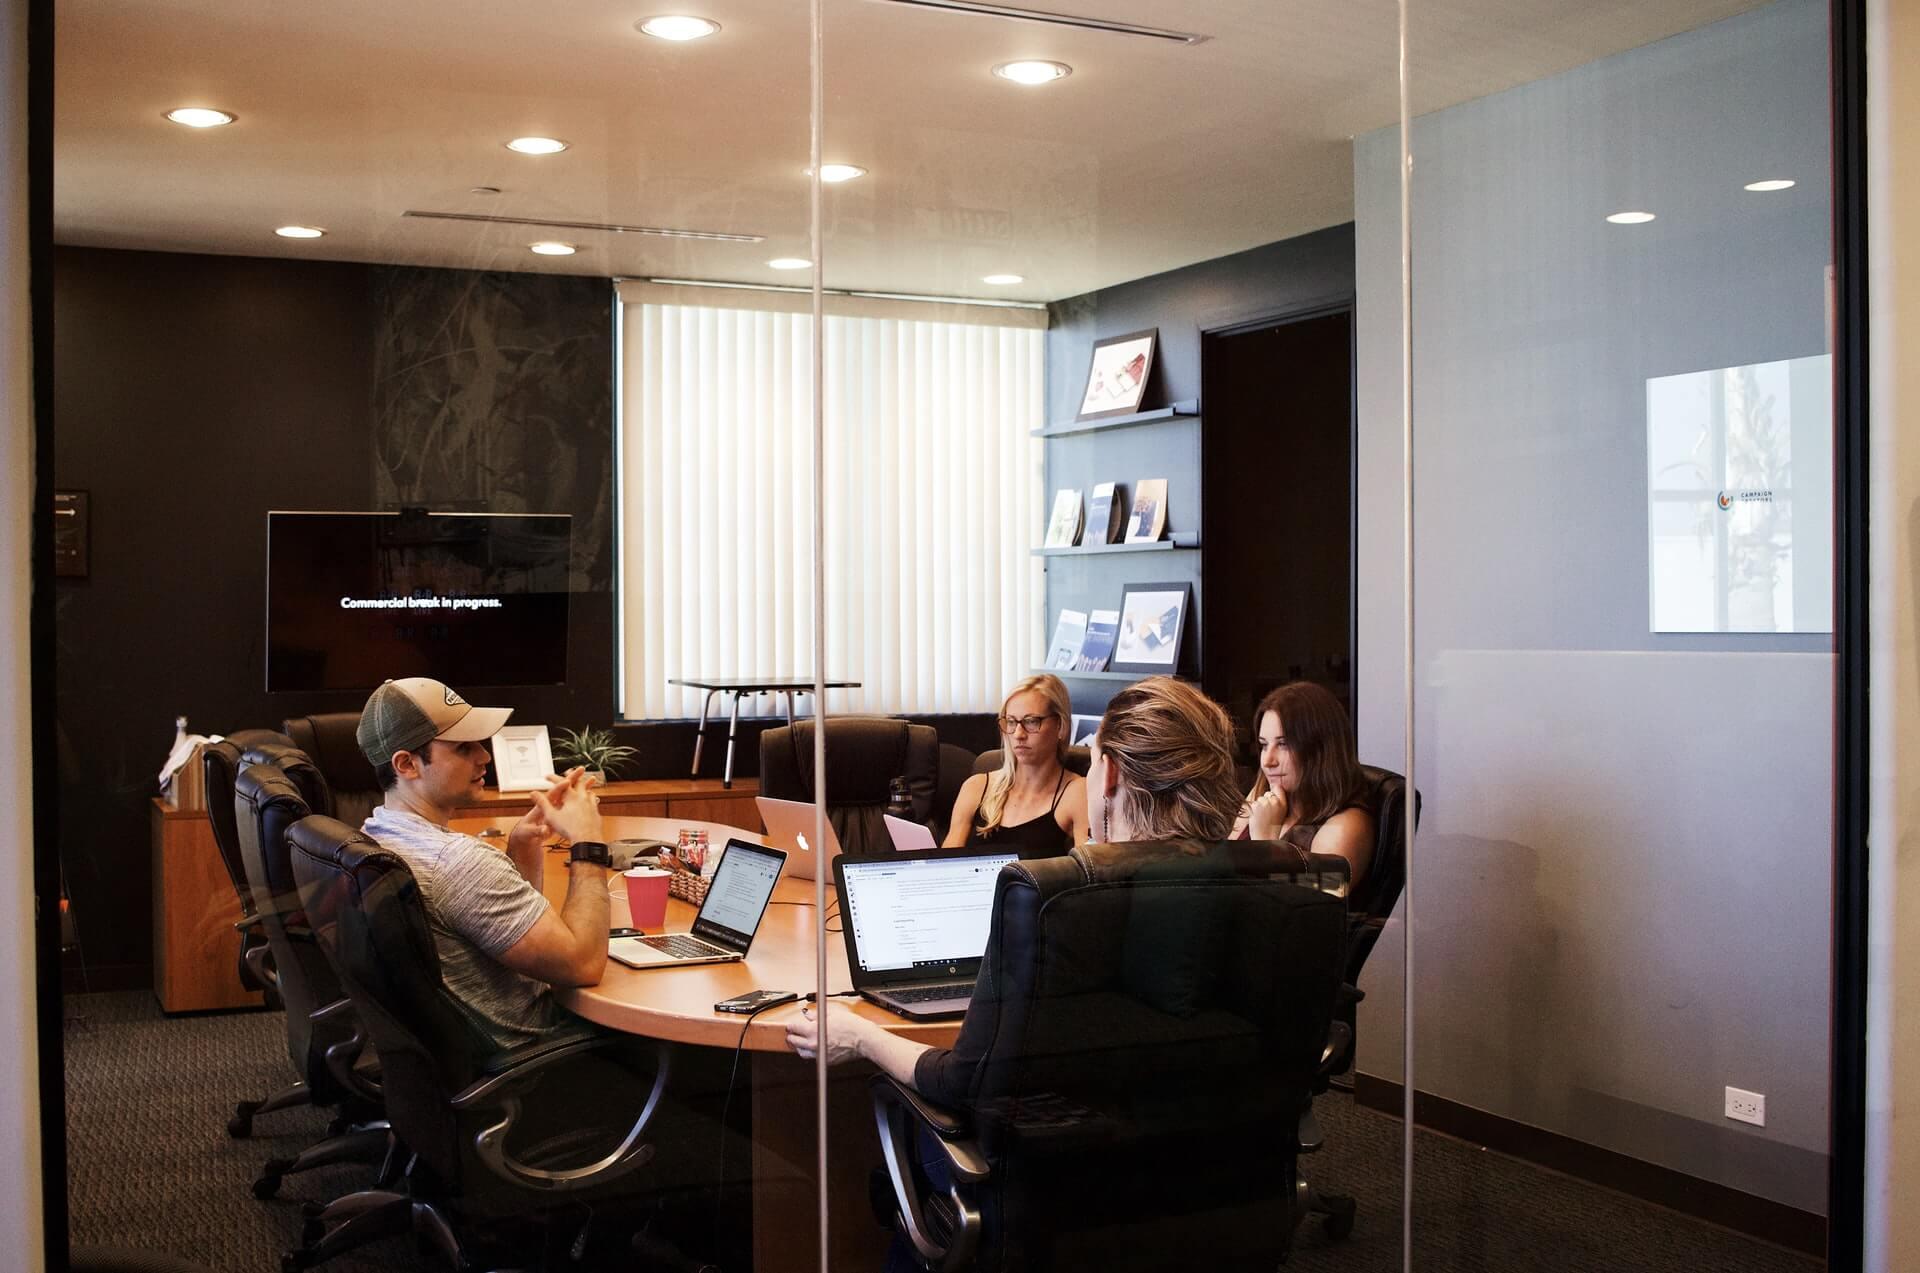 advantages-teamwork-brainstorming-meeting-conference-room